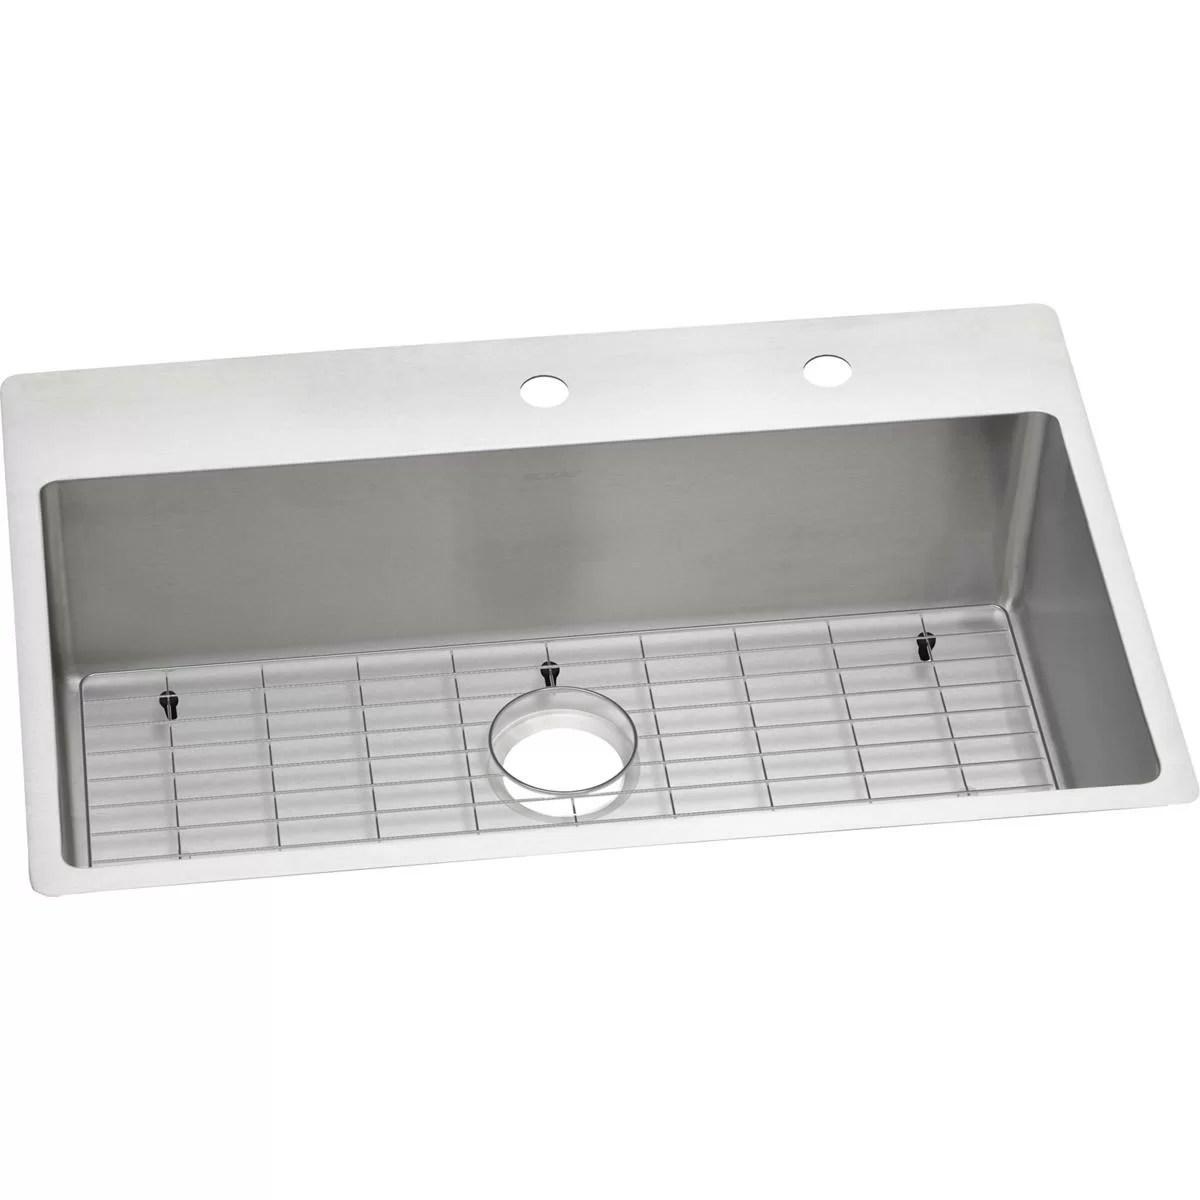 crosstown stainless steel 33 l x 22 w double basin dual mount kitchen sink